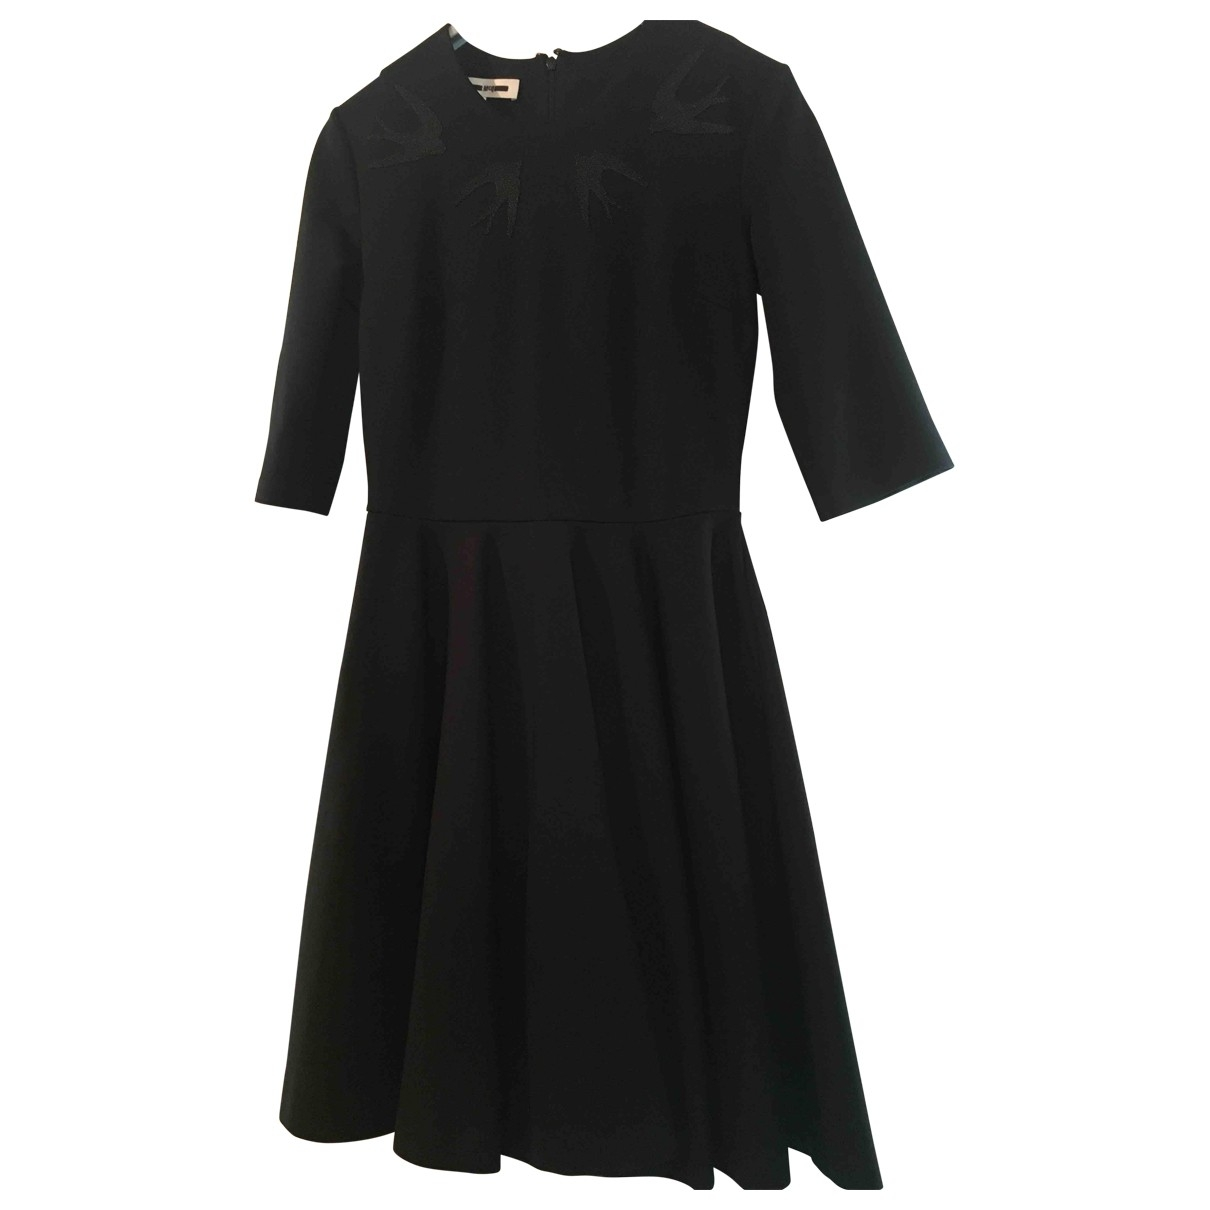 Mcq \N Kleid in  Schwarz Baumwolle - Elasthan